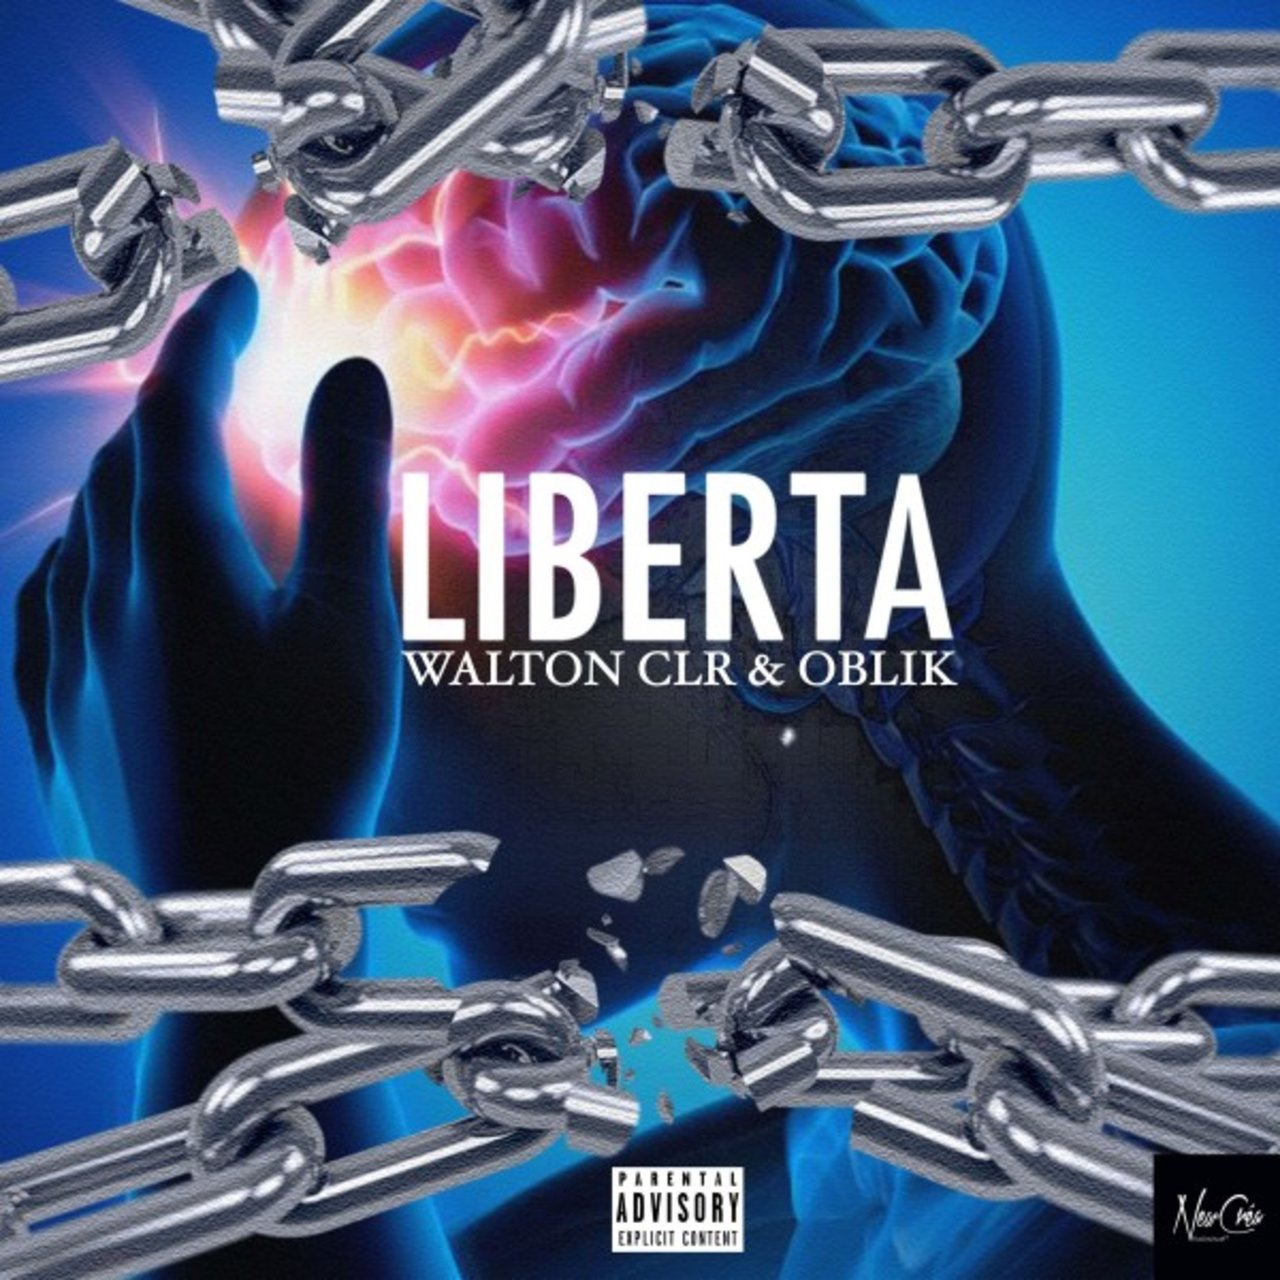 Walton and Oblik - Liberta (Cover)